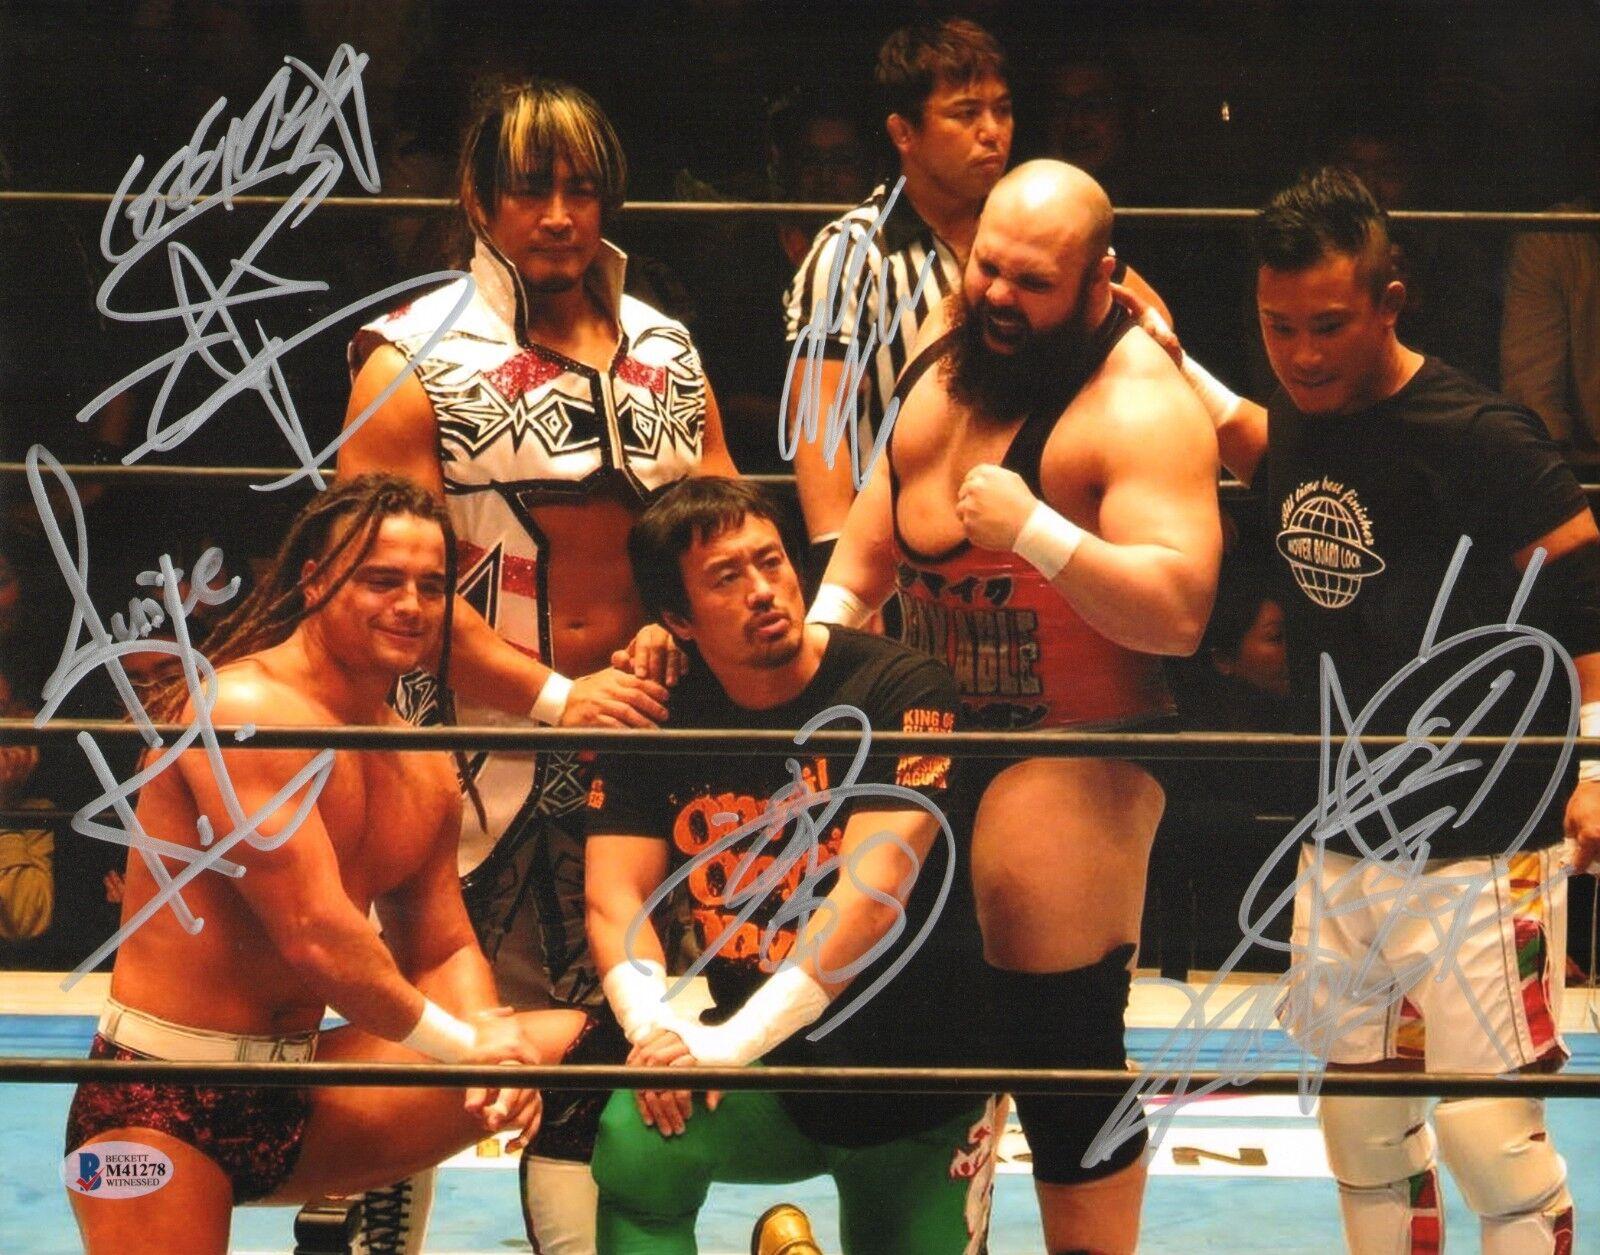 Hiroshi Tanahashi Jus Robinson Kushida + 2 Signé 11x14 Photo Bas COA Neuf Japon